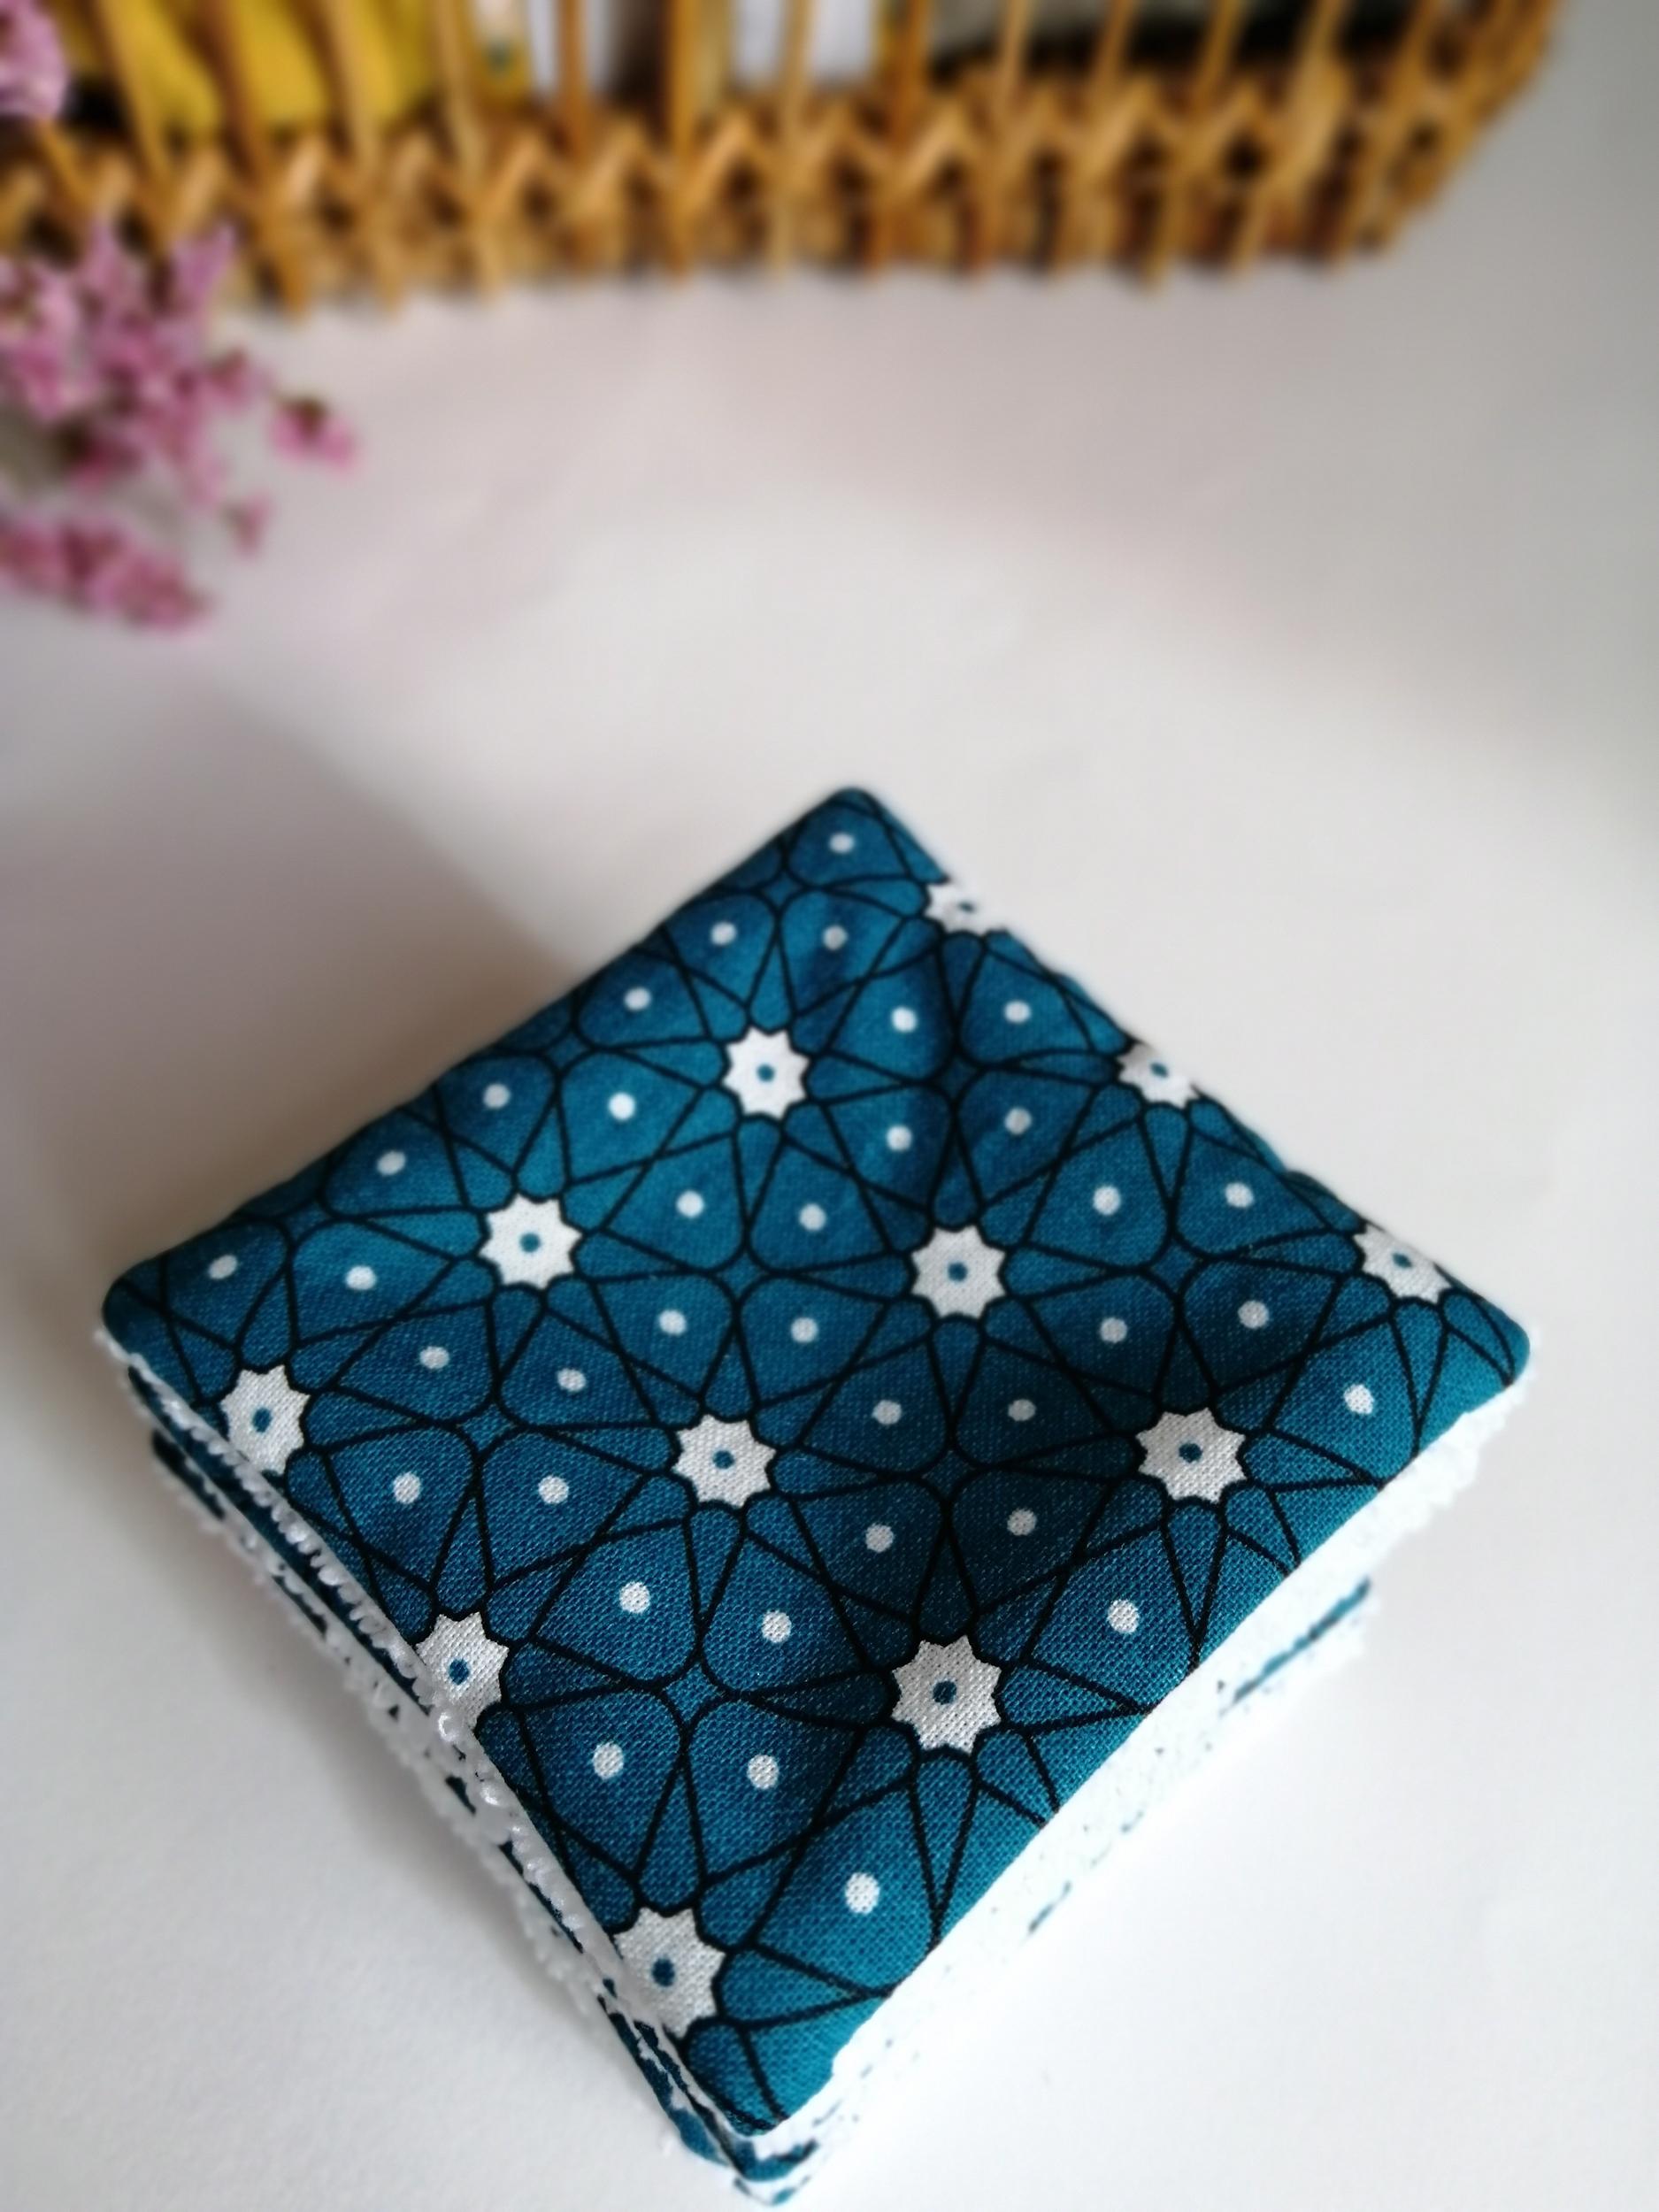 Lot de 8 lingettes démaquillantes lavables motif asanoha bleu